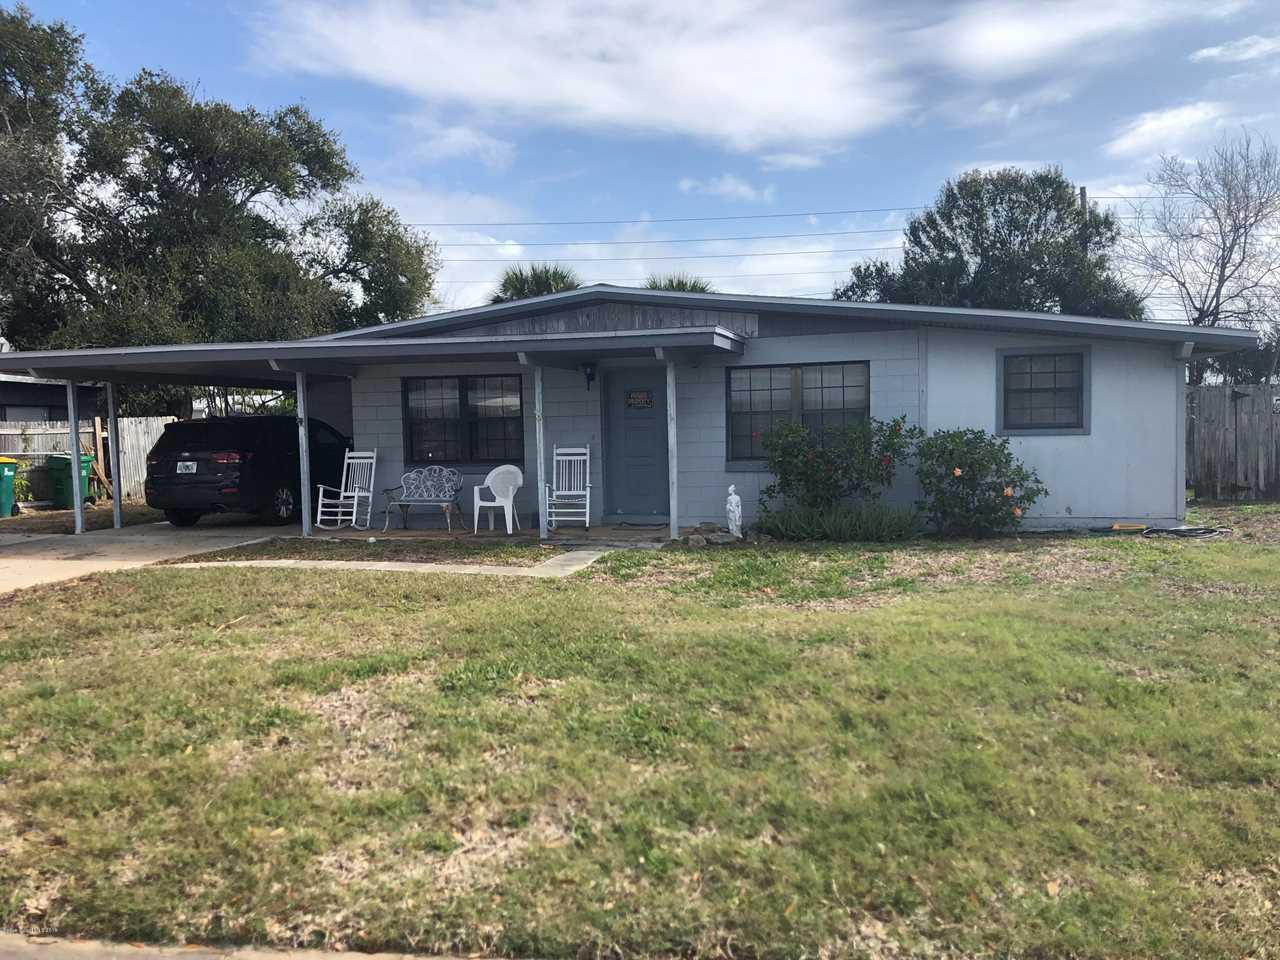 340 Glen Haven Drive Merritt Island, FL 32952 | MLS 836649 Photo 1